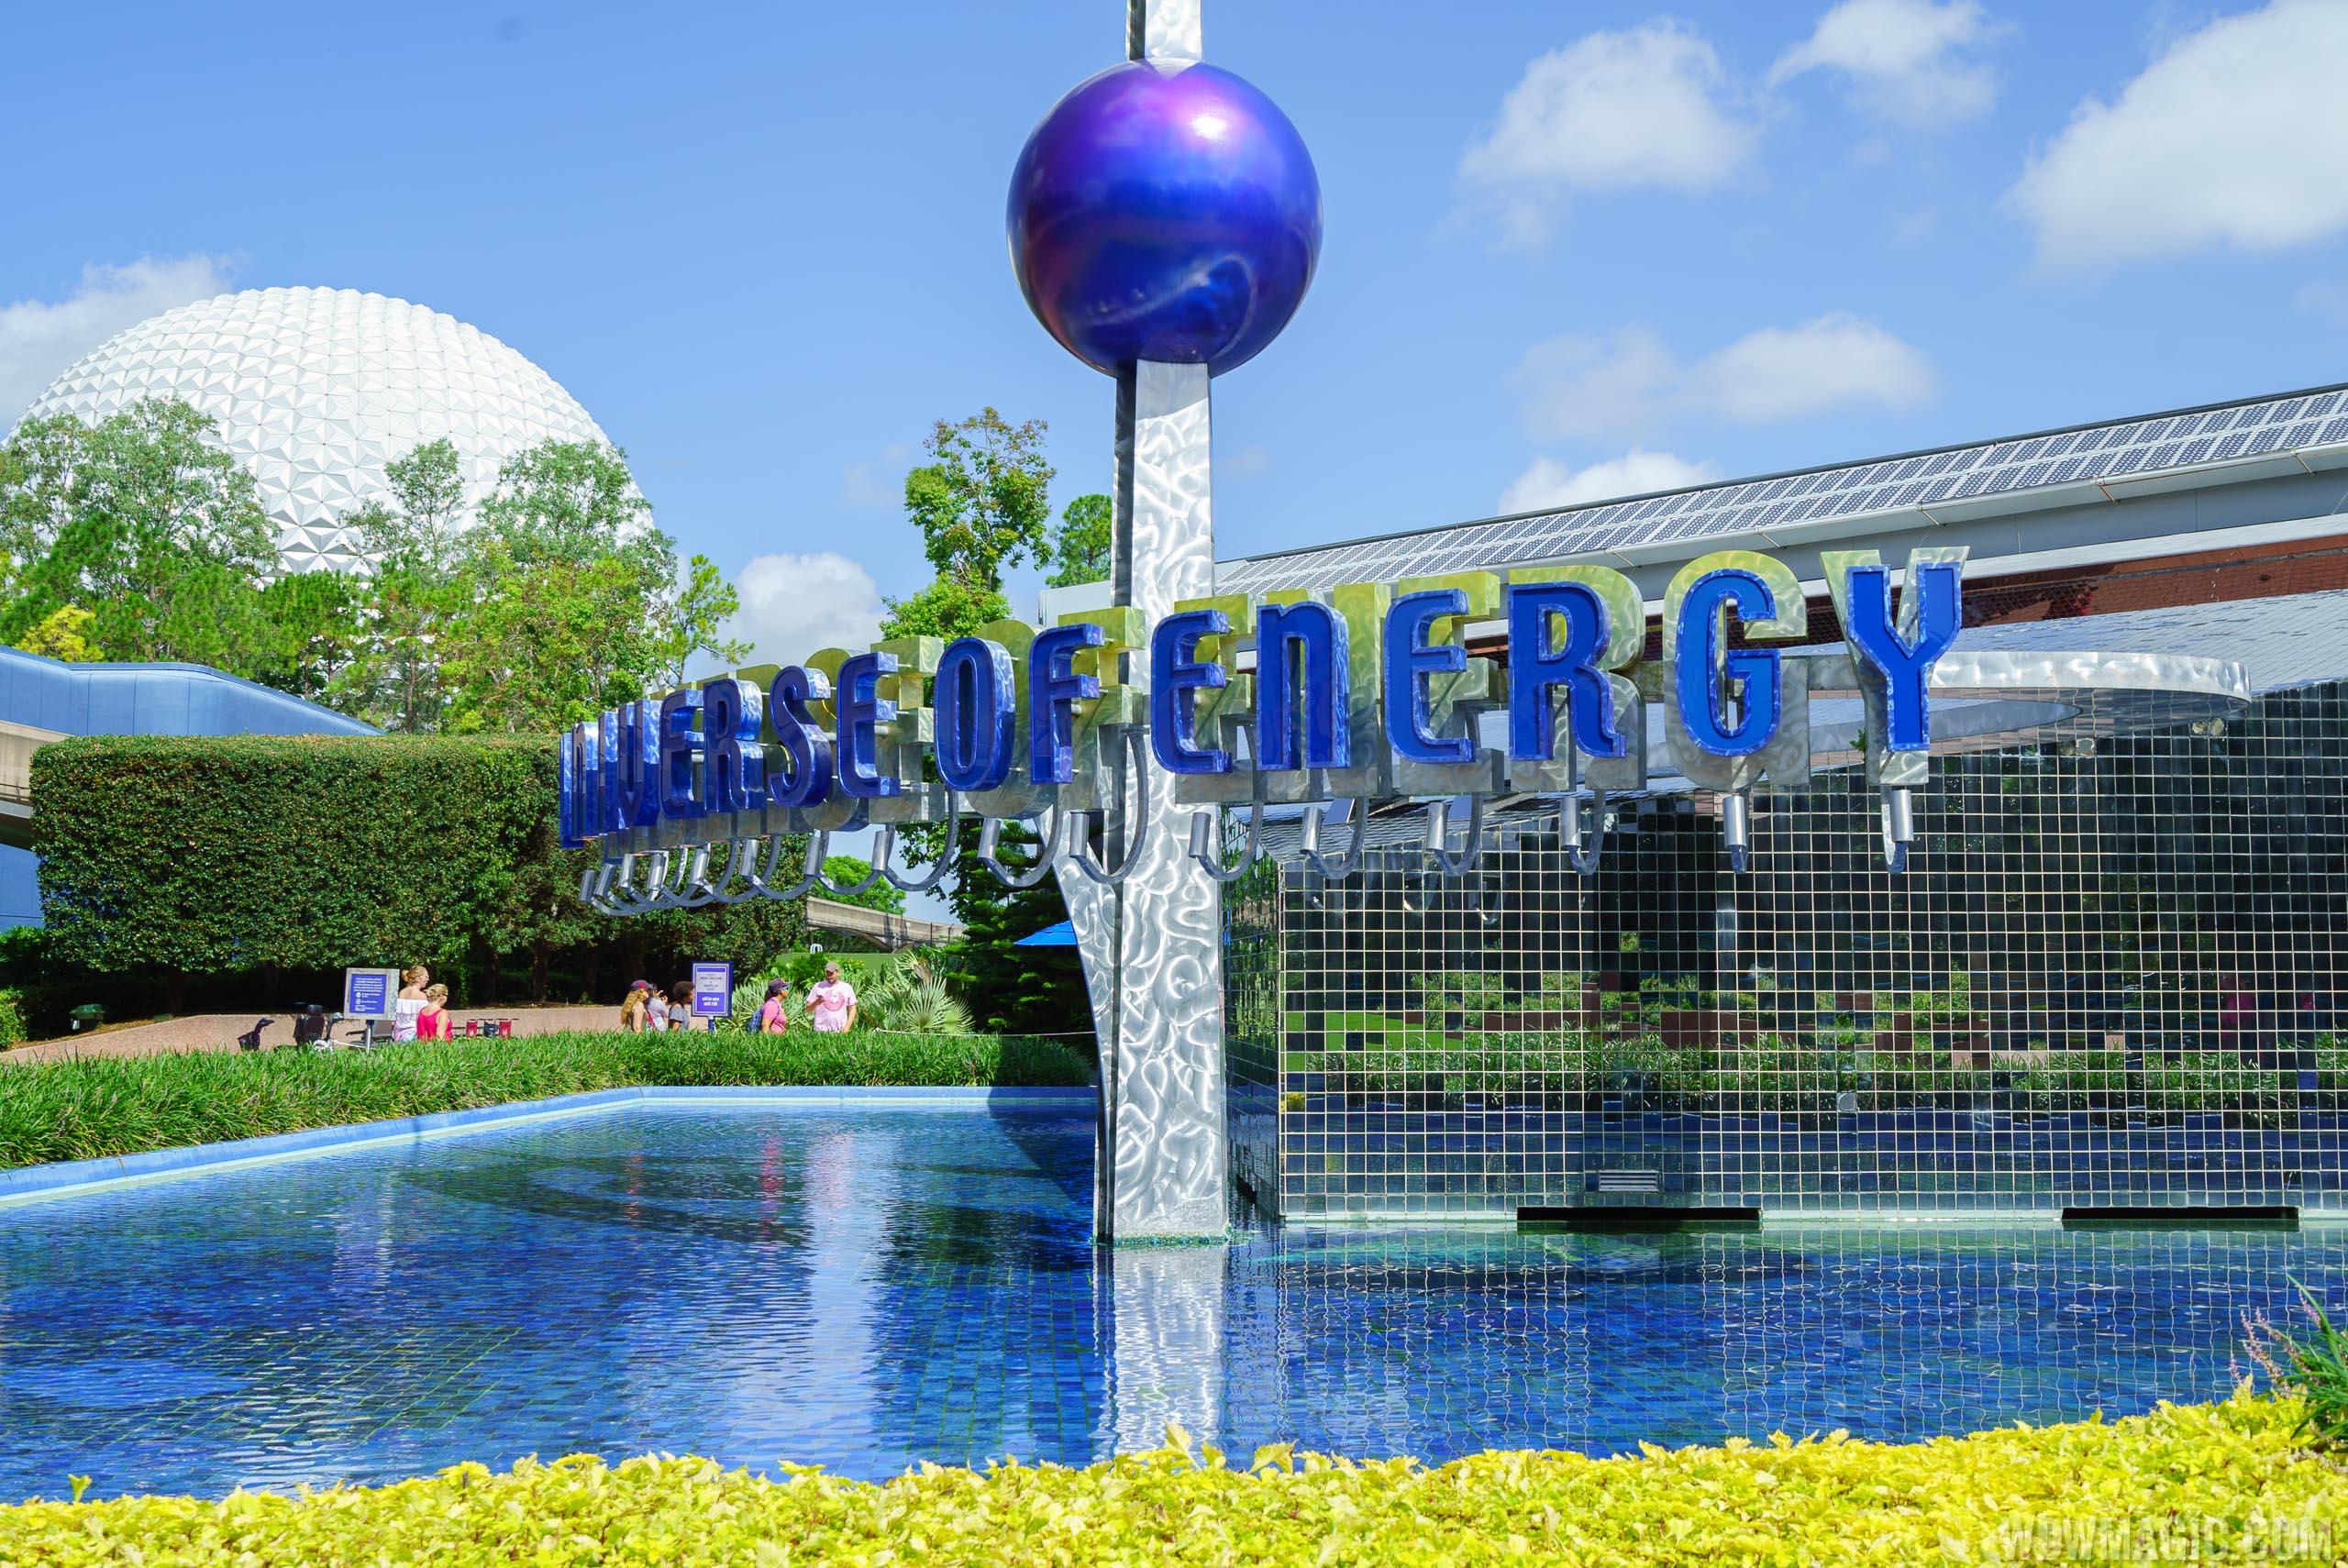 Ellen's Energy Adventure at the Universe of Energy